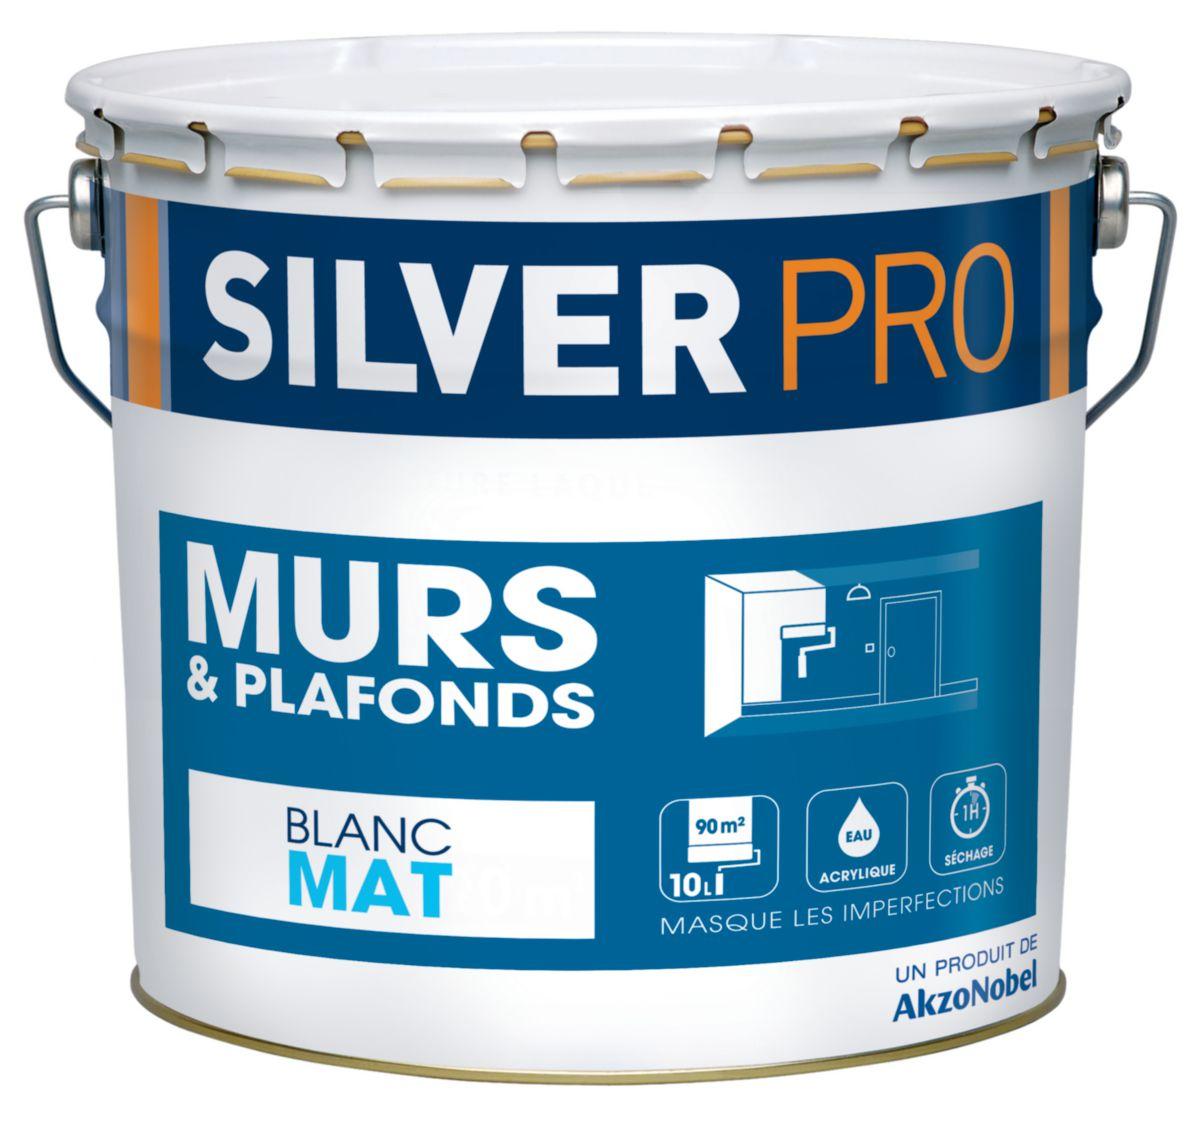 Peinture Mur Et Plafond Silverpro Am85 Blanc Mat Pot De 10 L